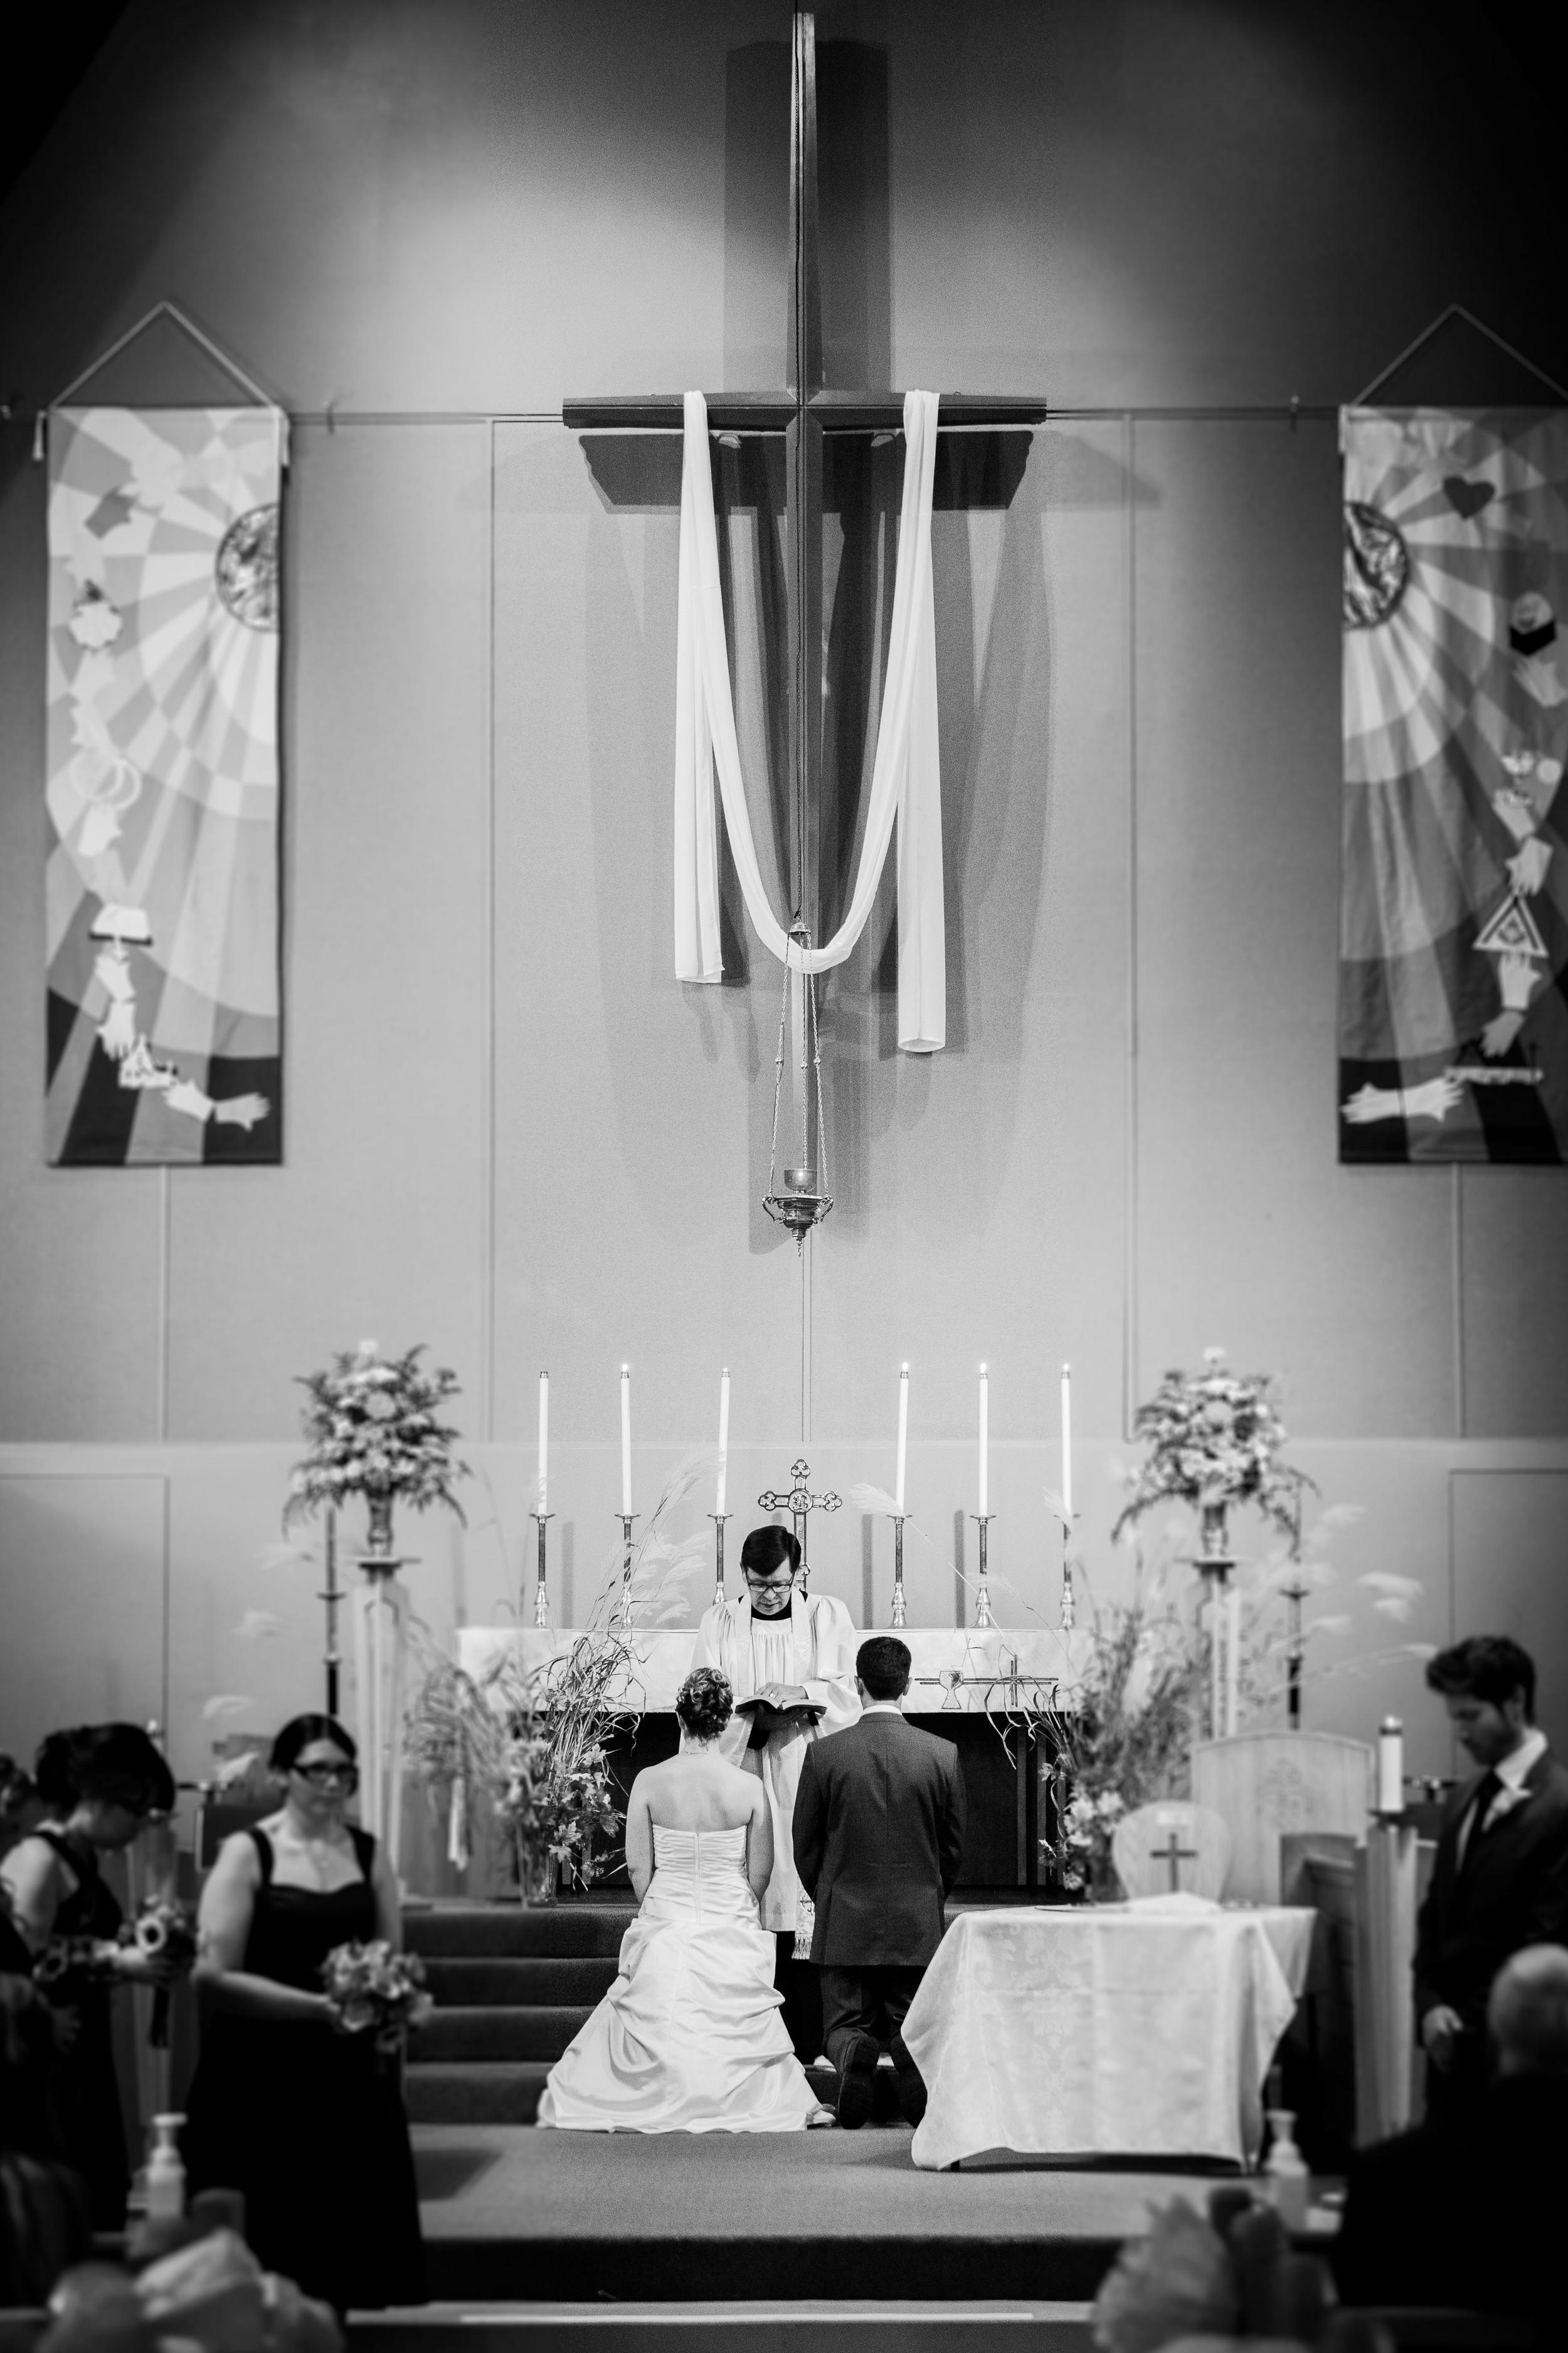 toronto_wedding_photography-Steph_Troy-21.jpg